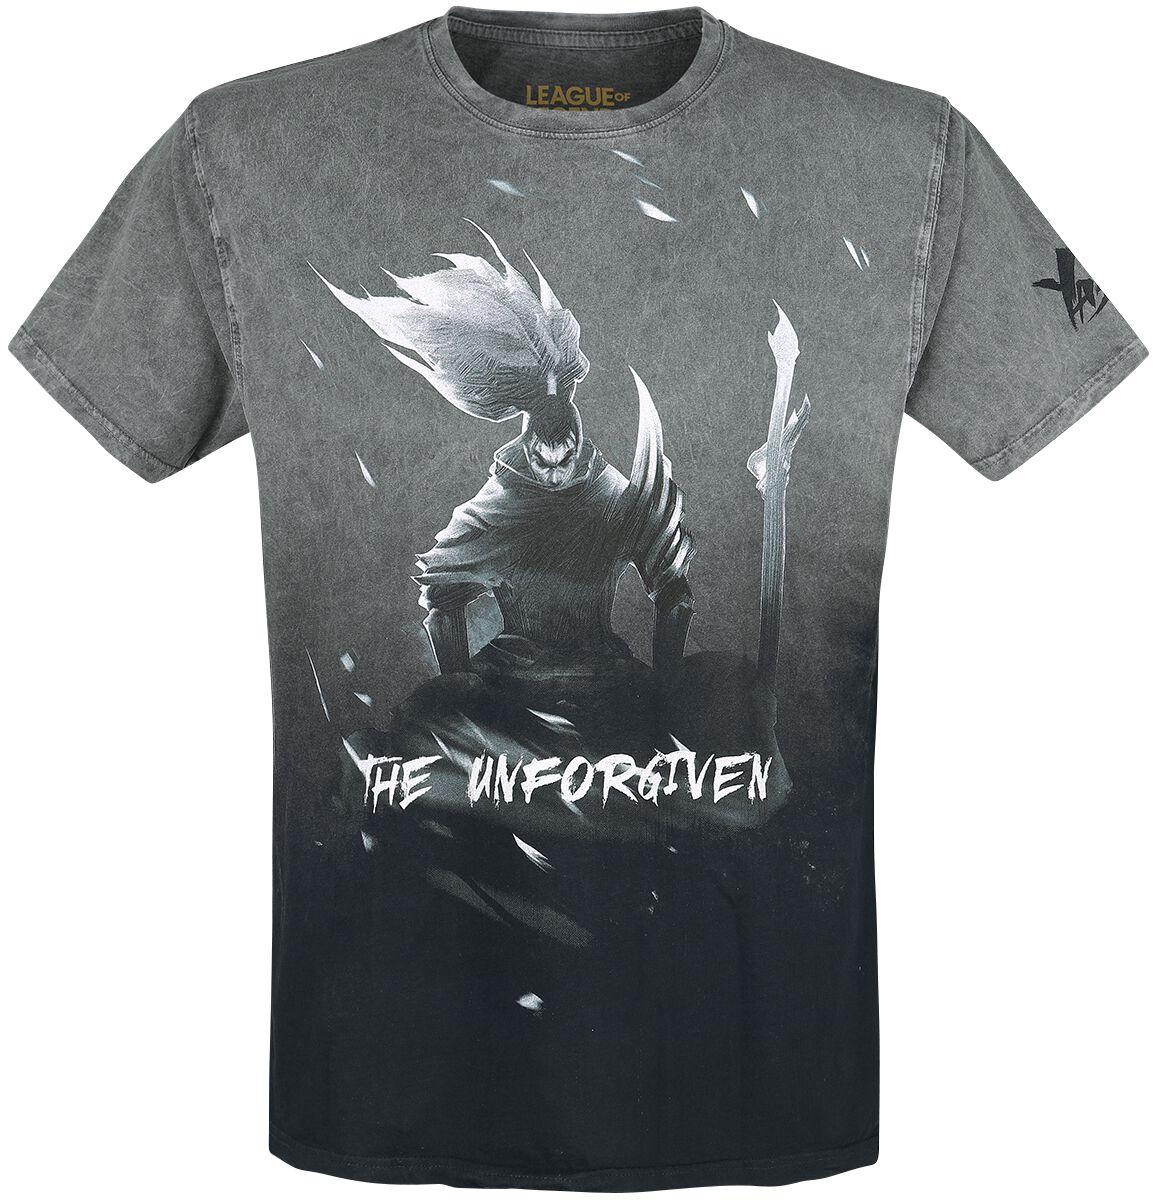 League Of Legends Yasuo T-Shirt grau M415840